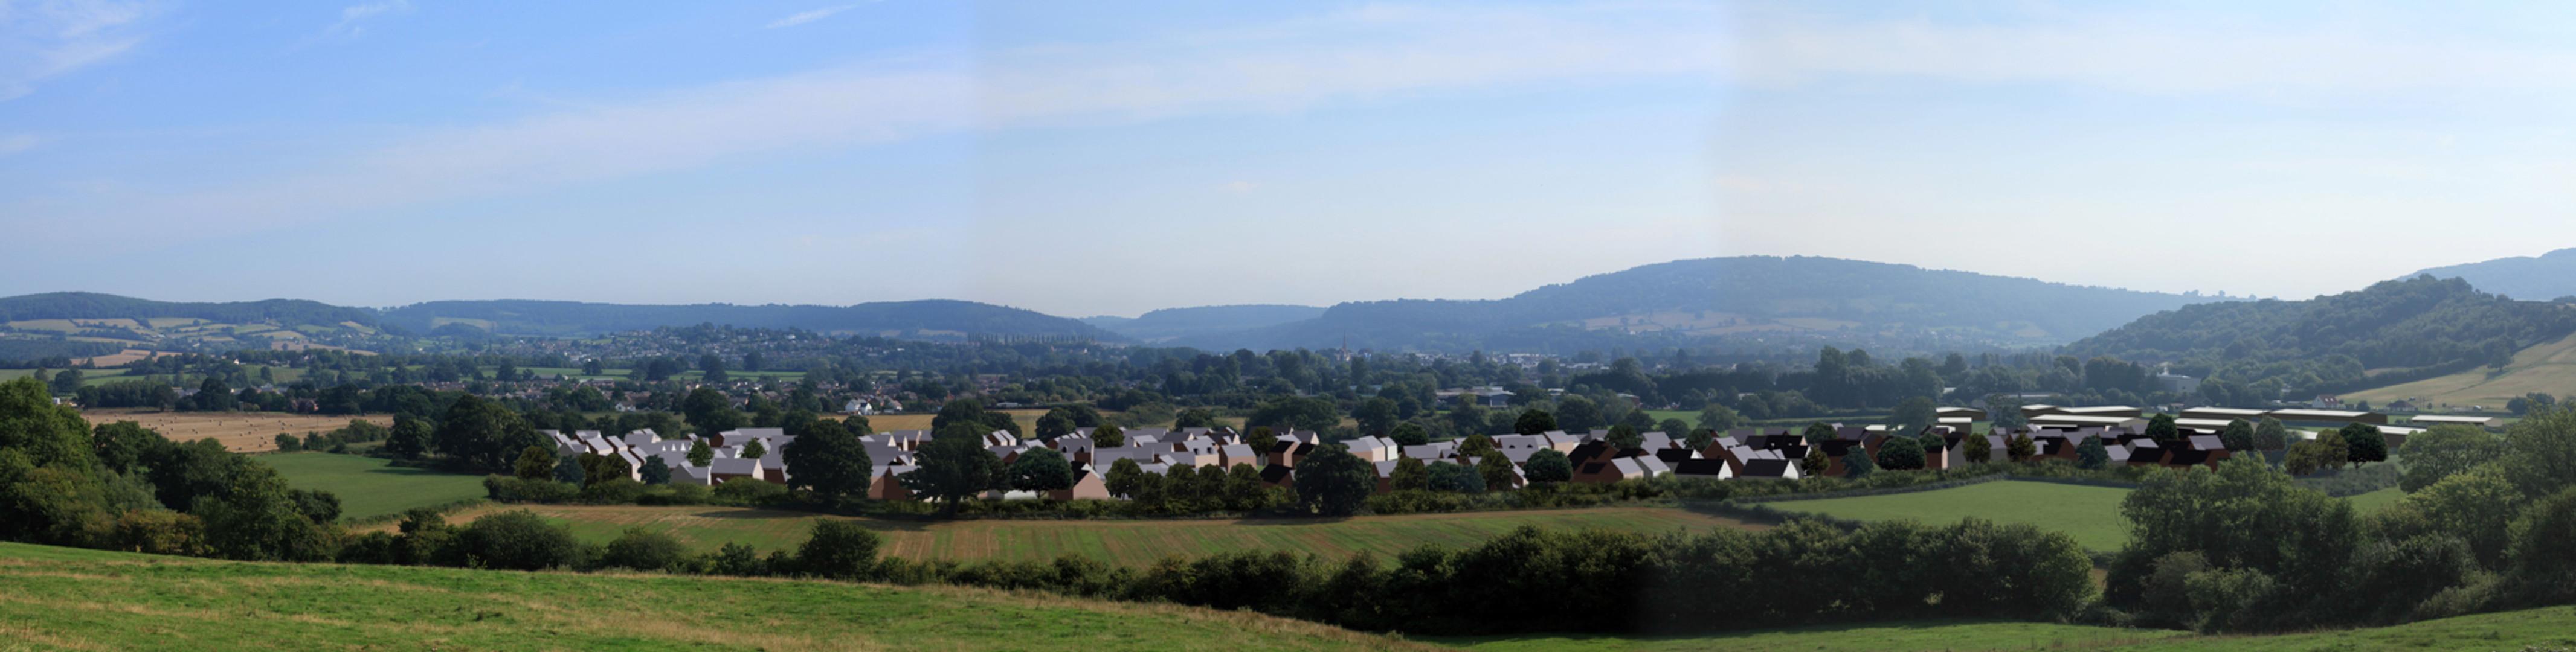 Wonastow Rd, Monmouth Photomontage